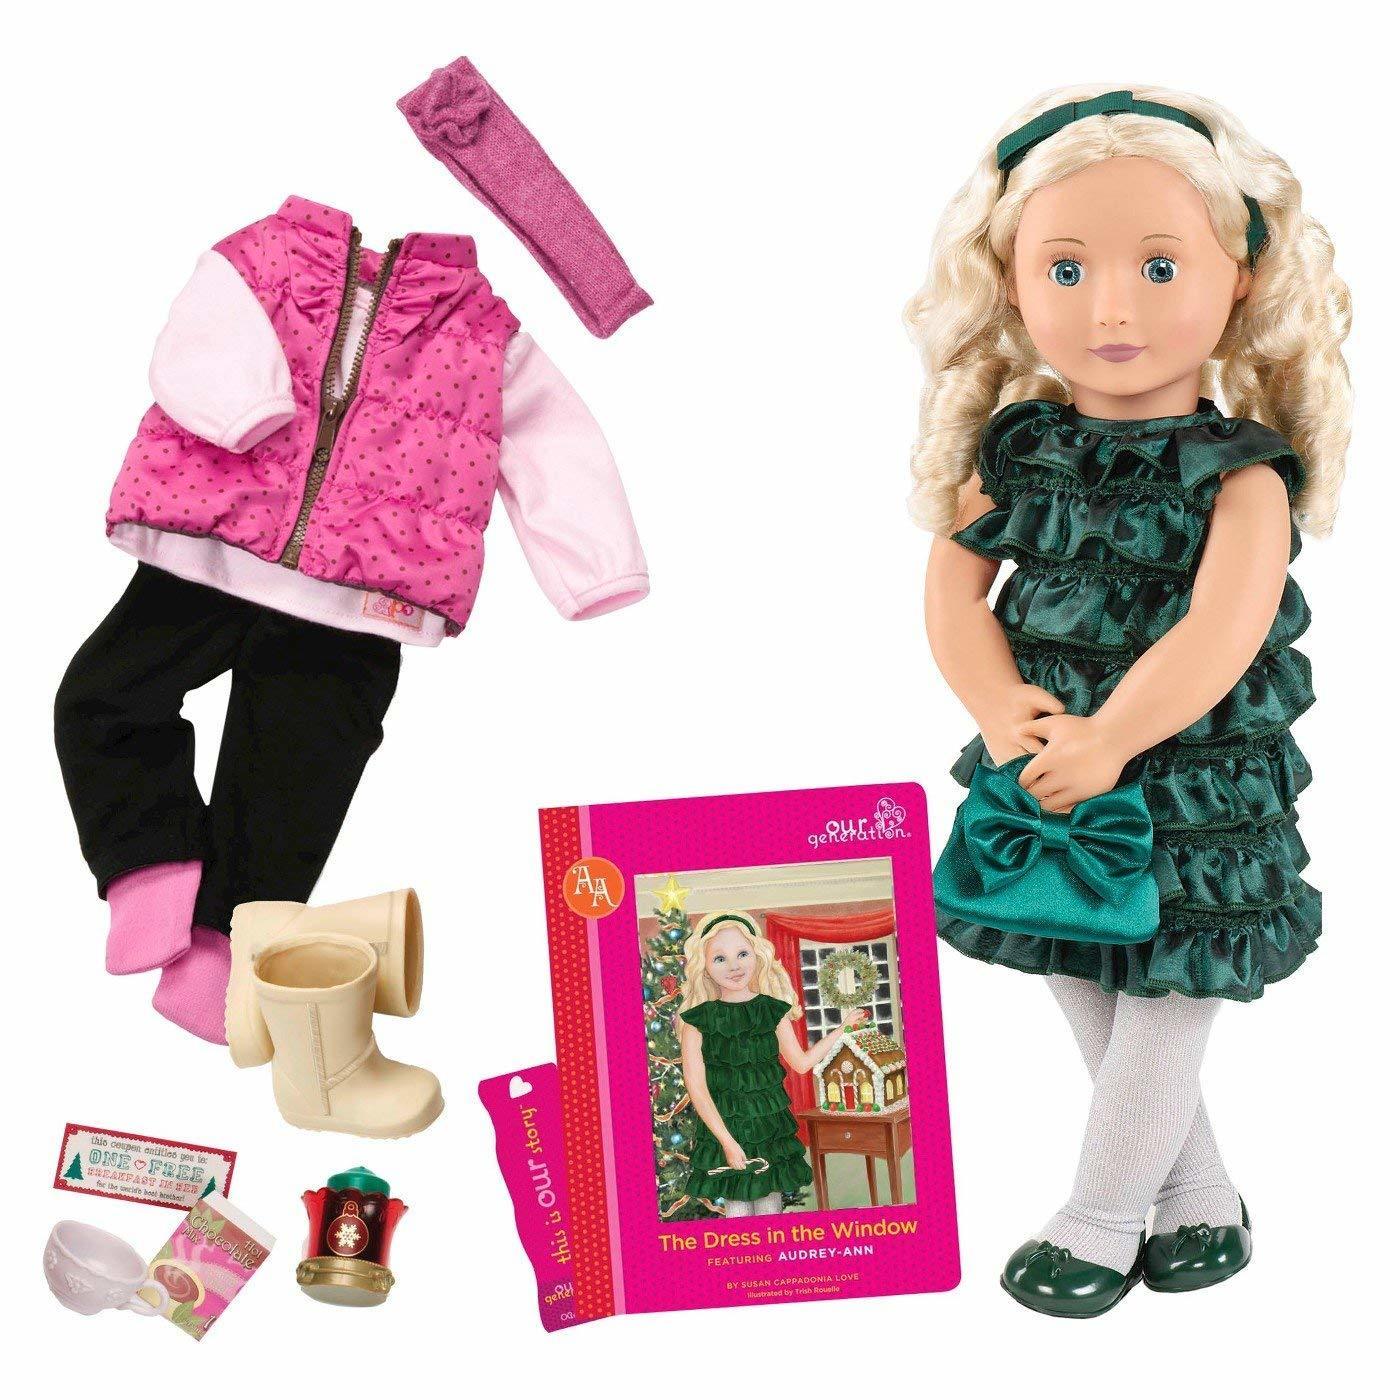 Our Generation Лялька DELUXE - Одрі-Енн із книгою